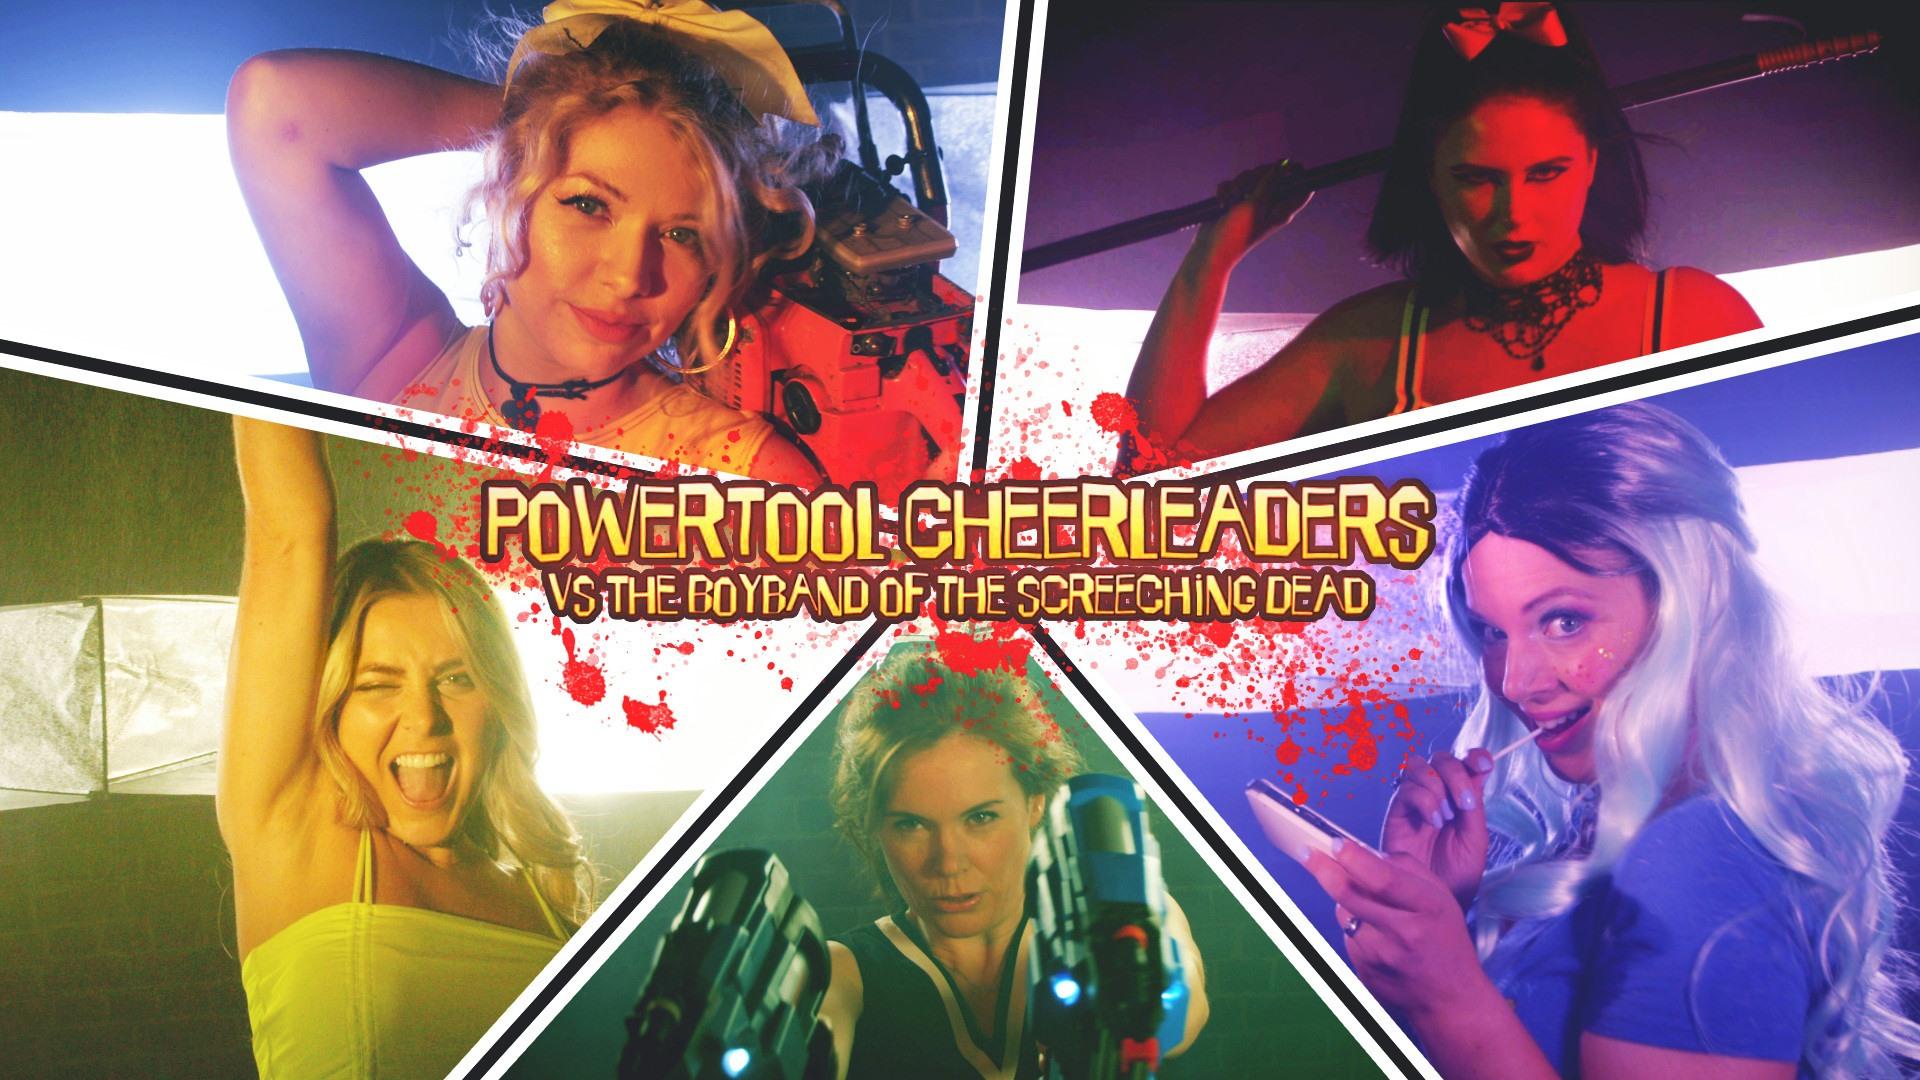 'Powertool Cheerleaders' most popular Kickstarter movie on the planet